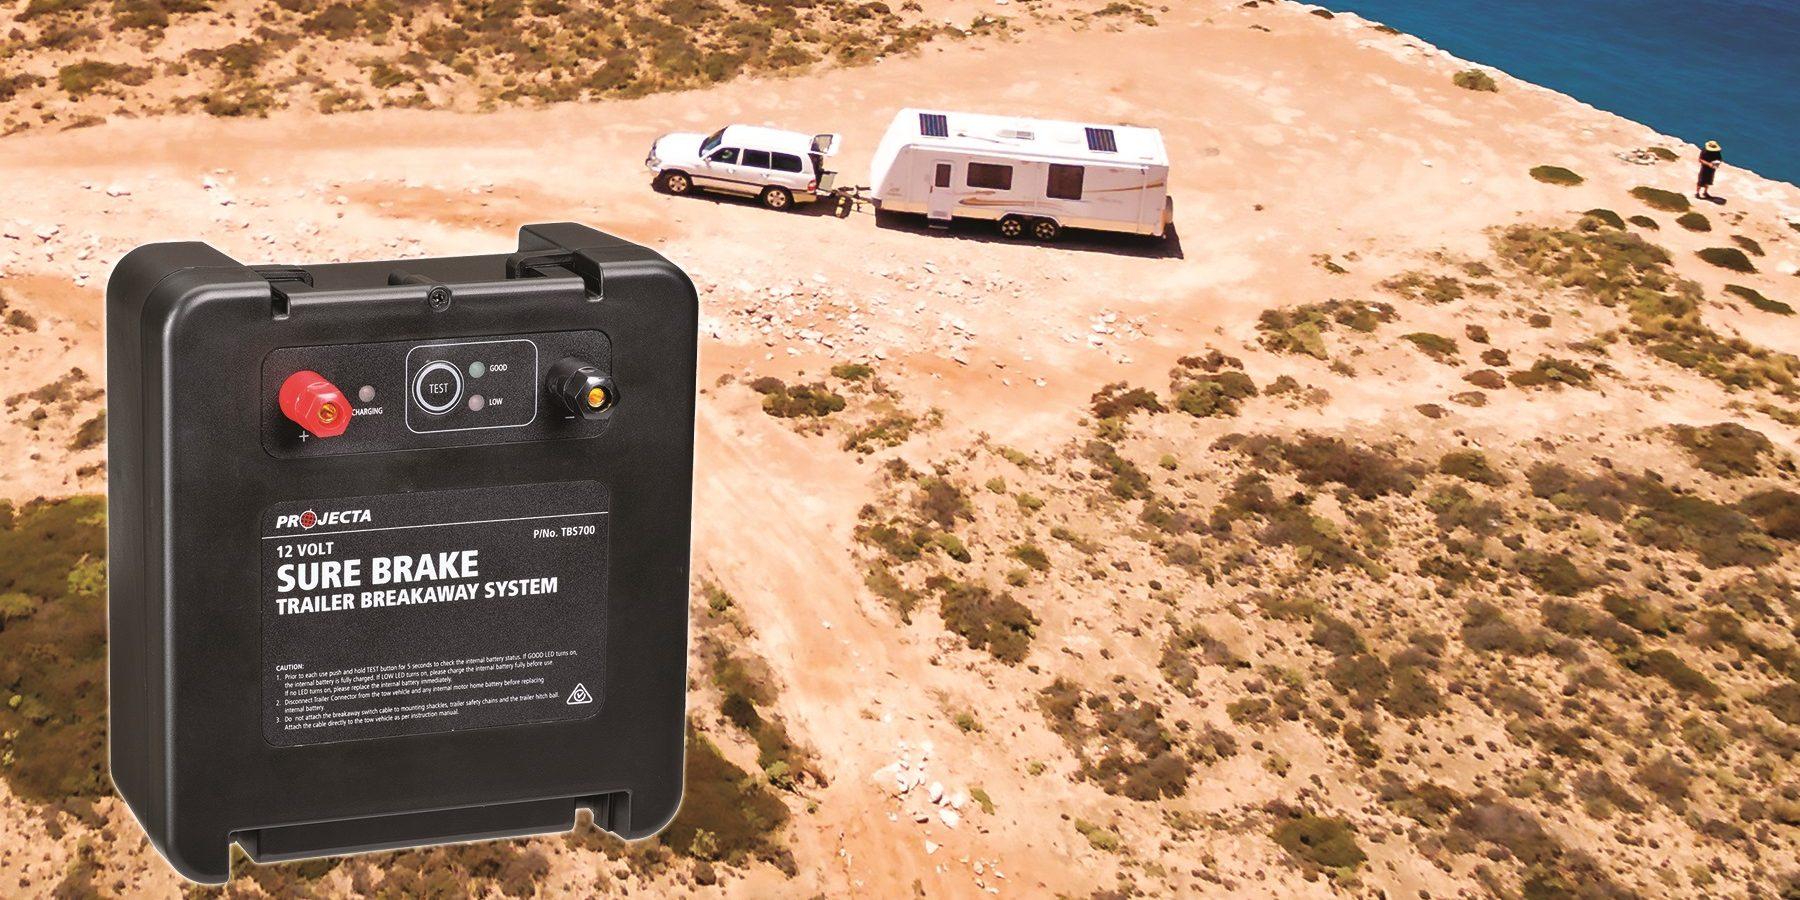 Projecta releases emergency trailer breakaway kit, Sure Brake